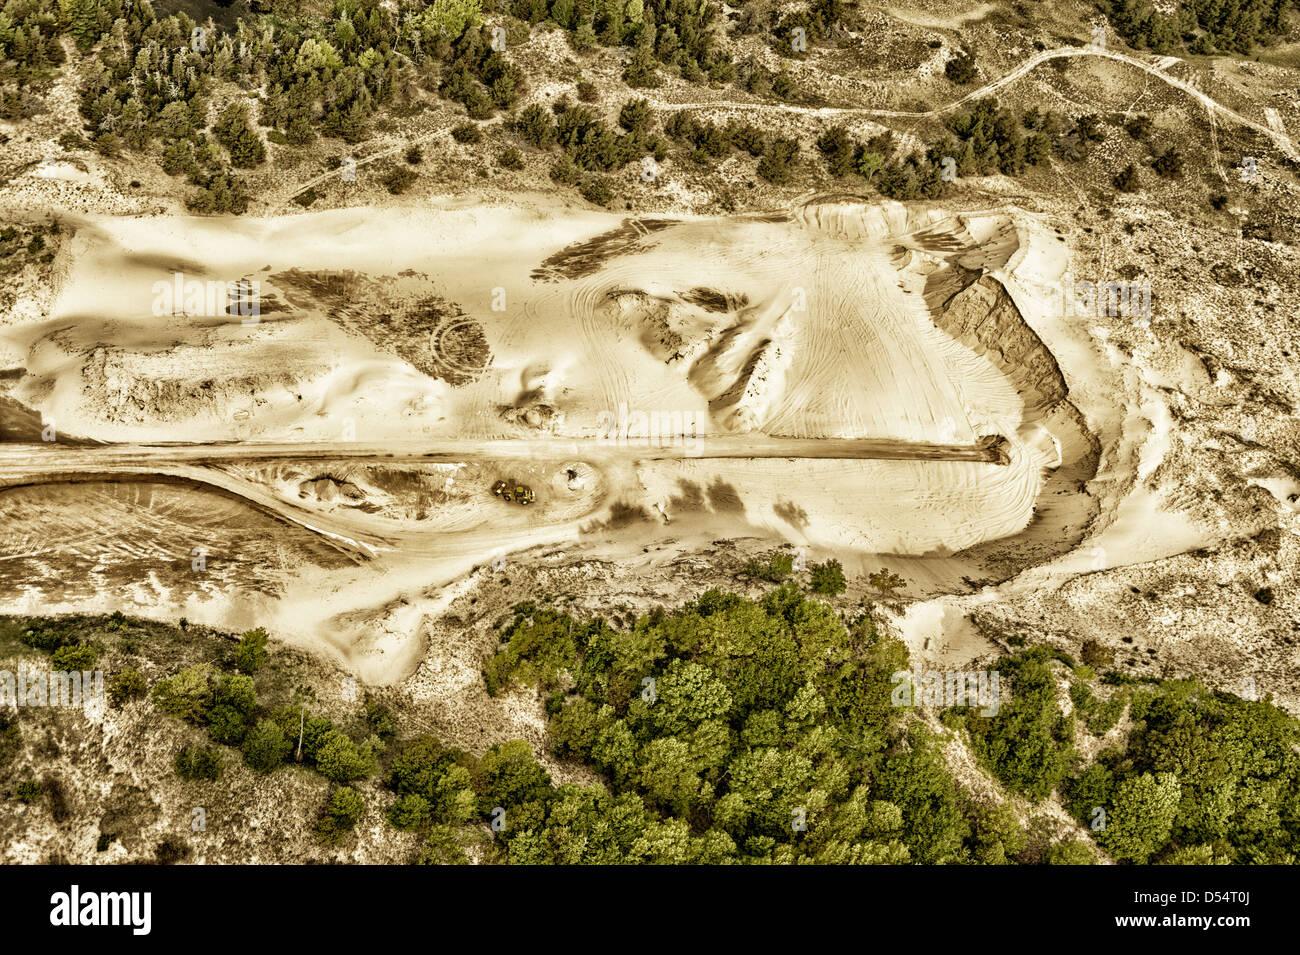 Aerial view of sand mining operation adjacent to Ludington Dunes State Park near Ludington, Michigan, USA. Photography - Stock Image